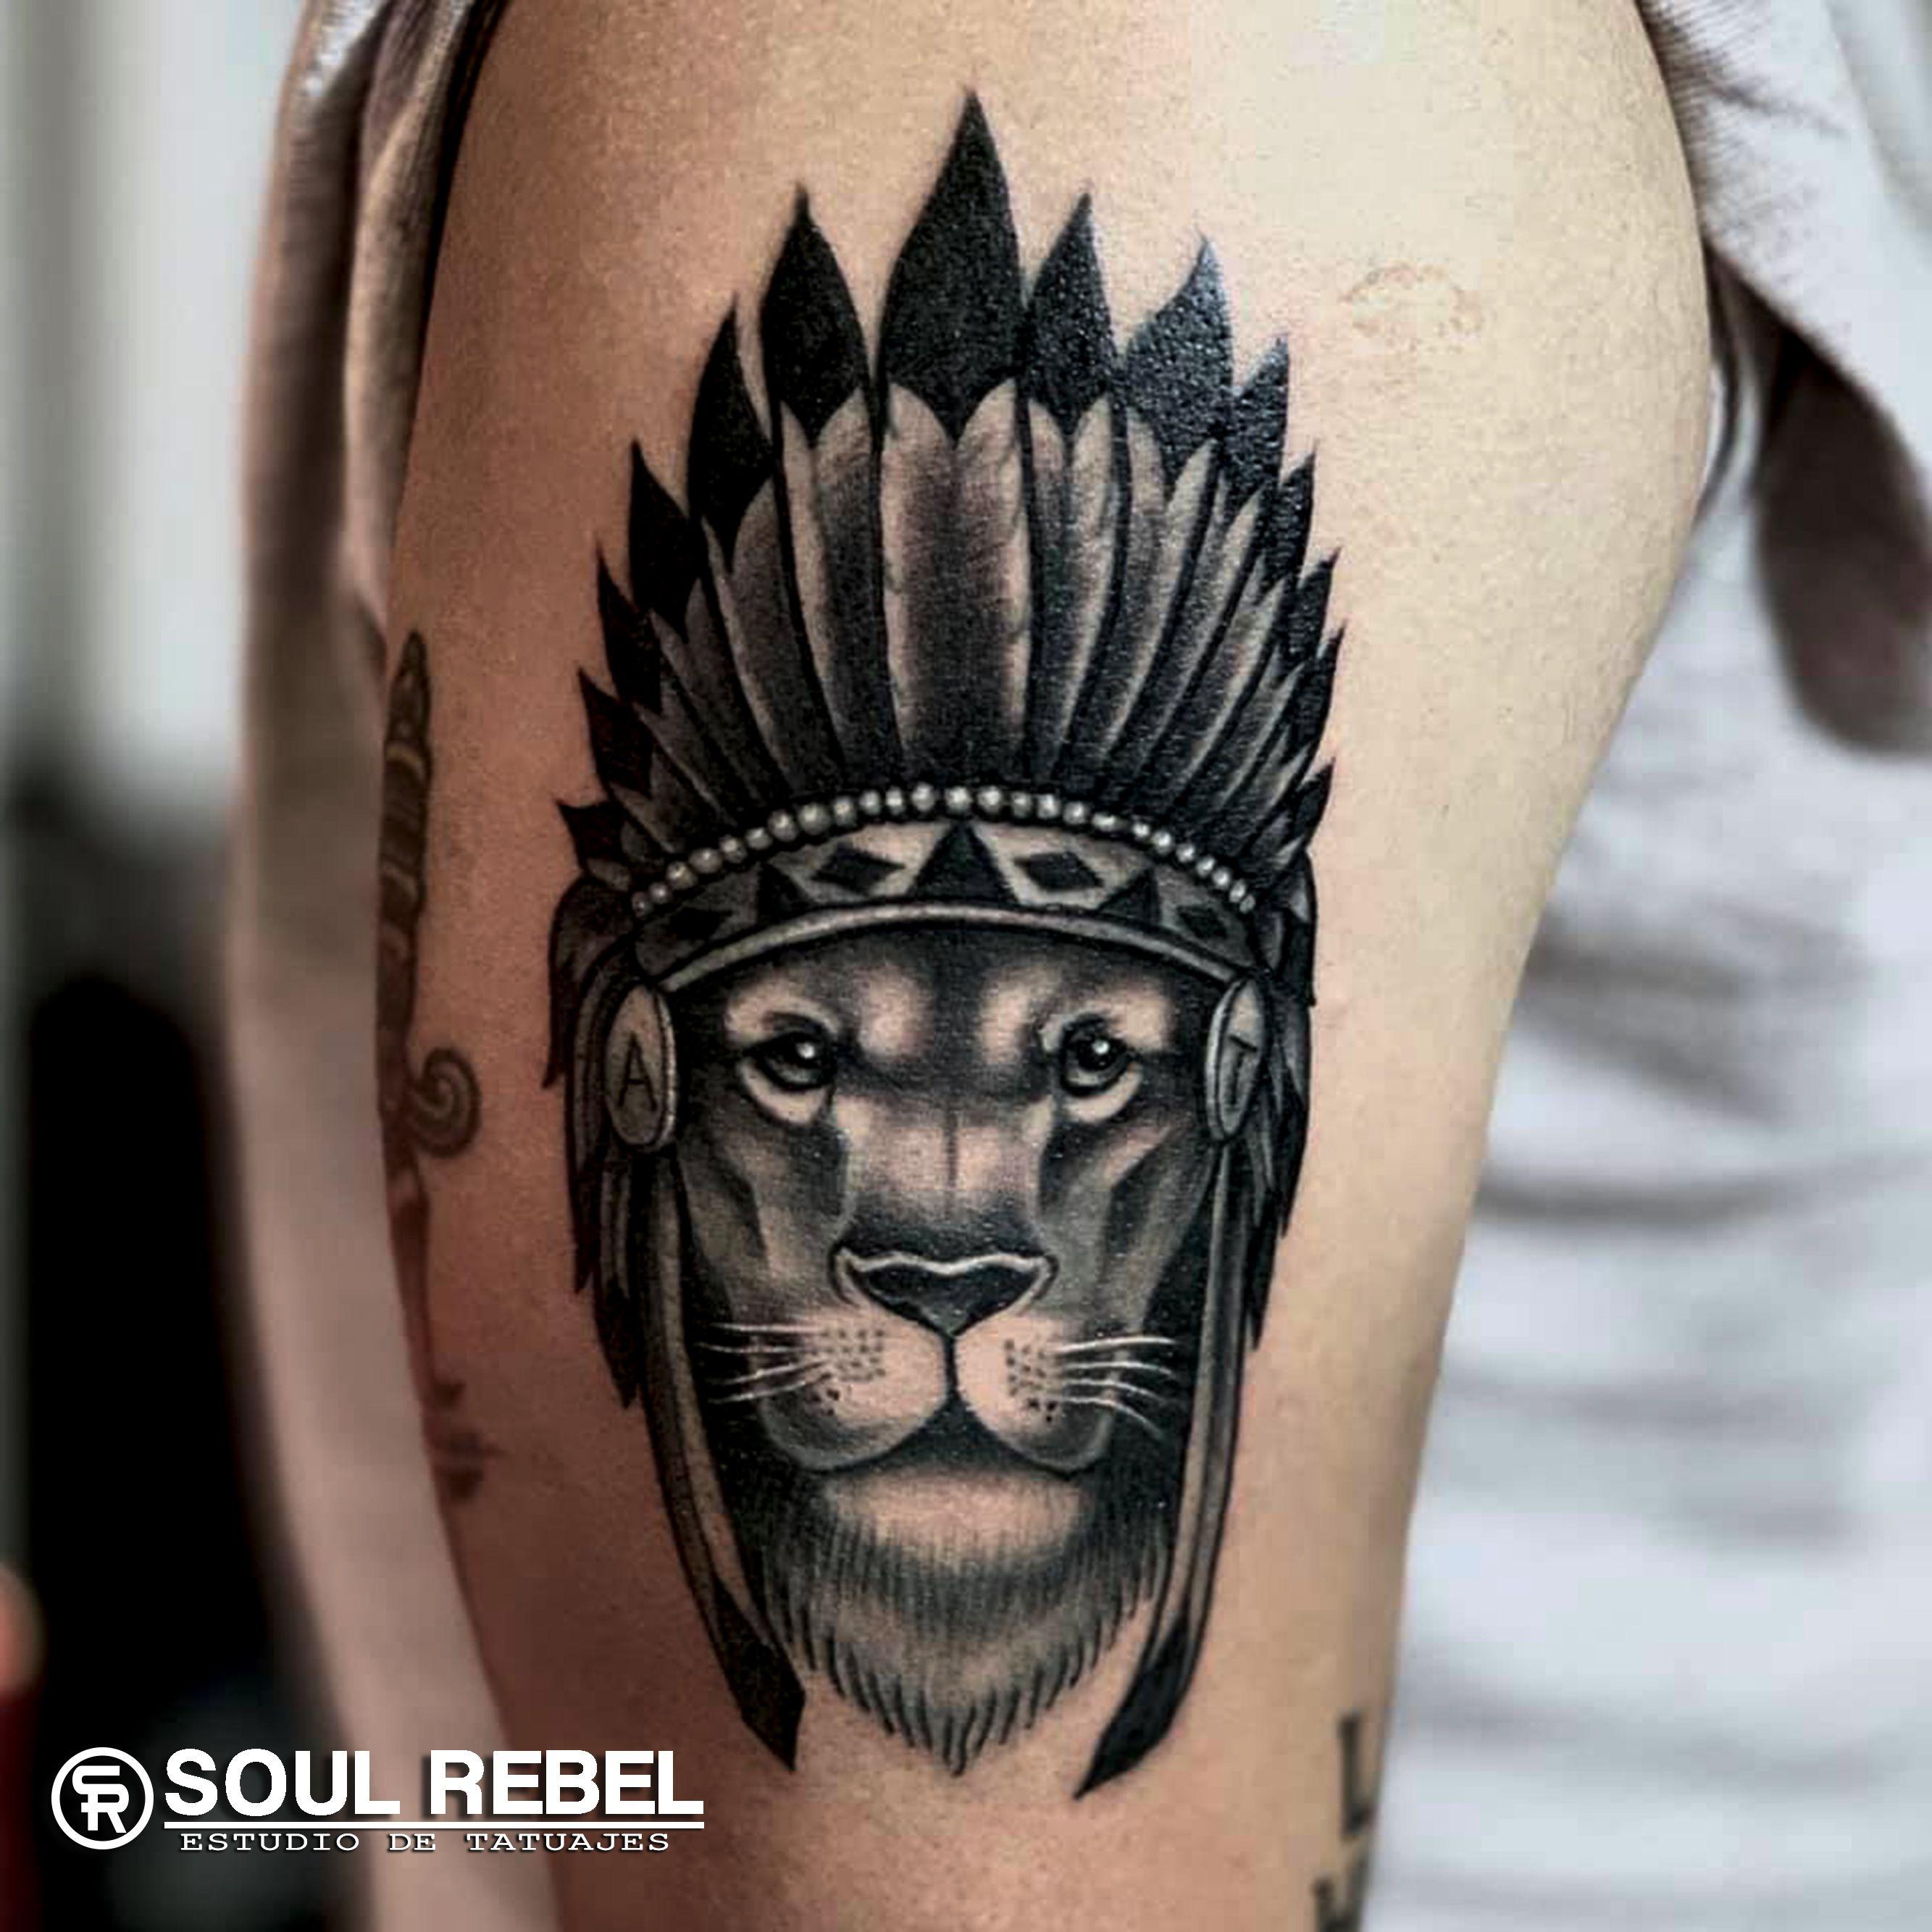 #tatauajeleon #liontattoo #tatuajepenacho #tatuajerralismo #realismtattoo #blackworktattoo #tatuajebrazo #armtattoo